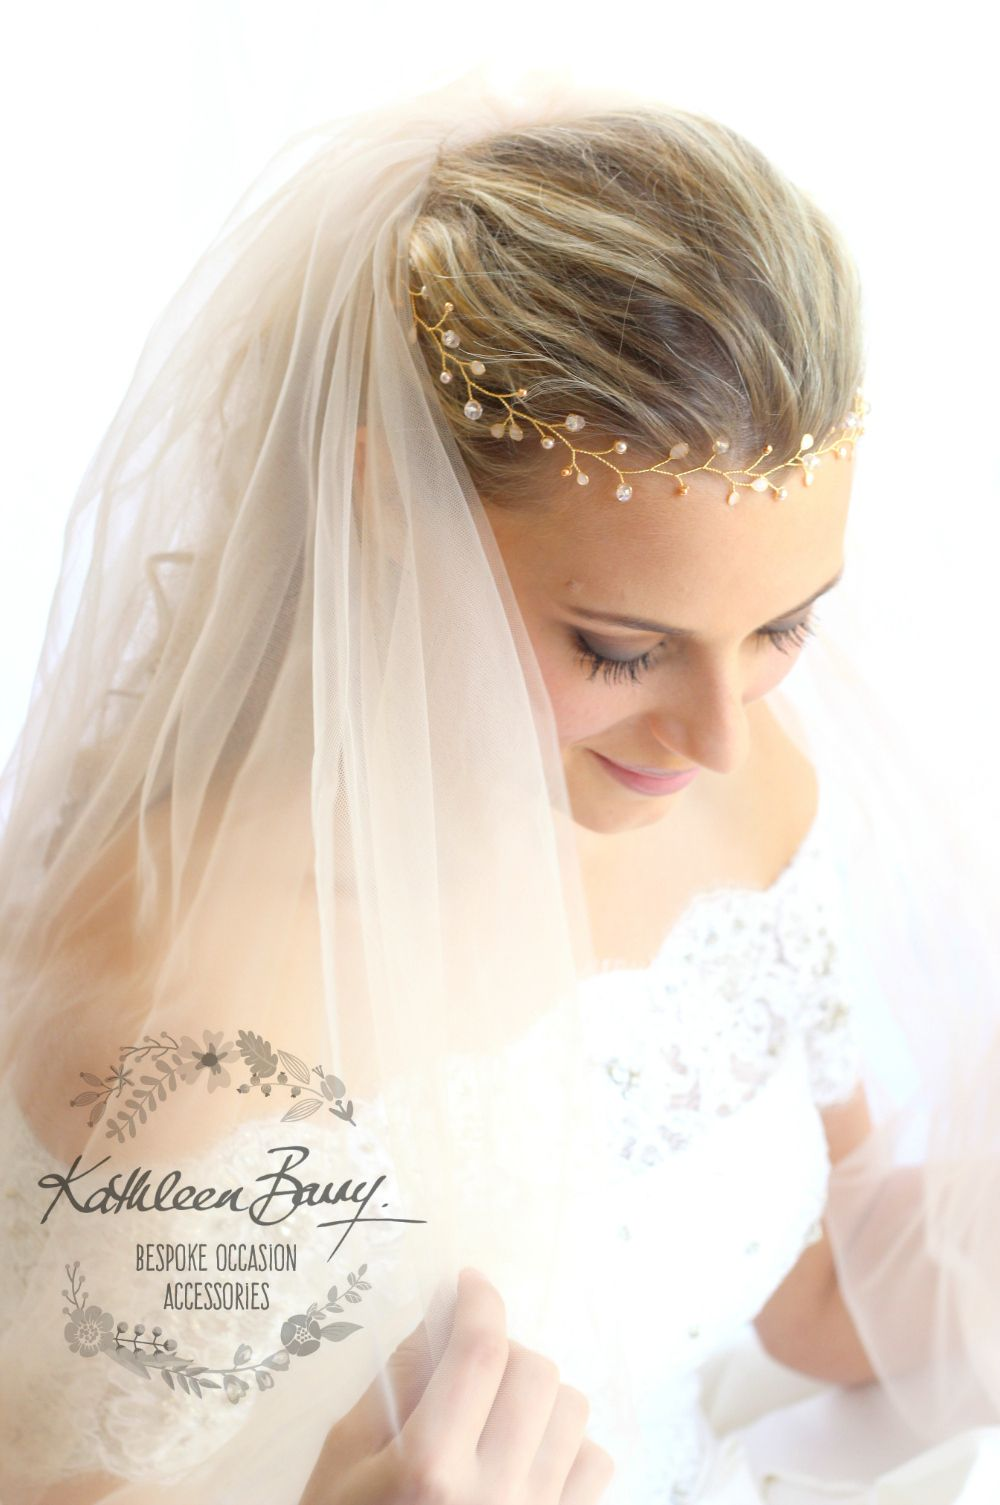 Rose gold wedding hair accessories - Rose Gold Bridal Hair Wreath Blush Pink Gold Wedding Hairpiece Rose Gold Tones Wedding Bridal Hair Accessory Hair Vine Style Helen